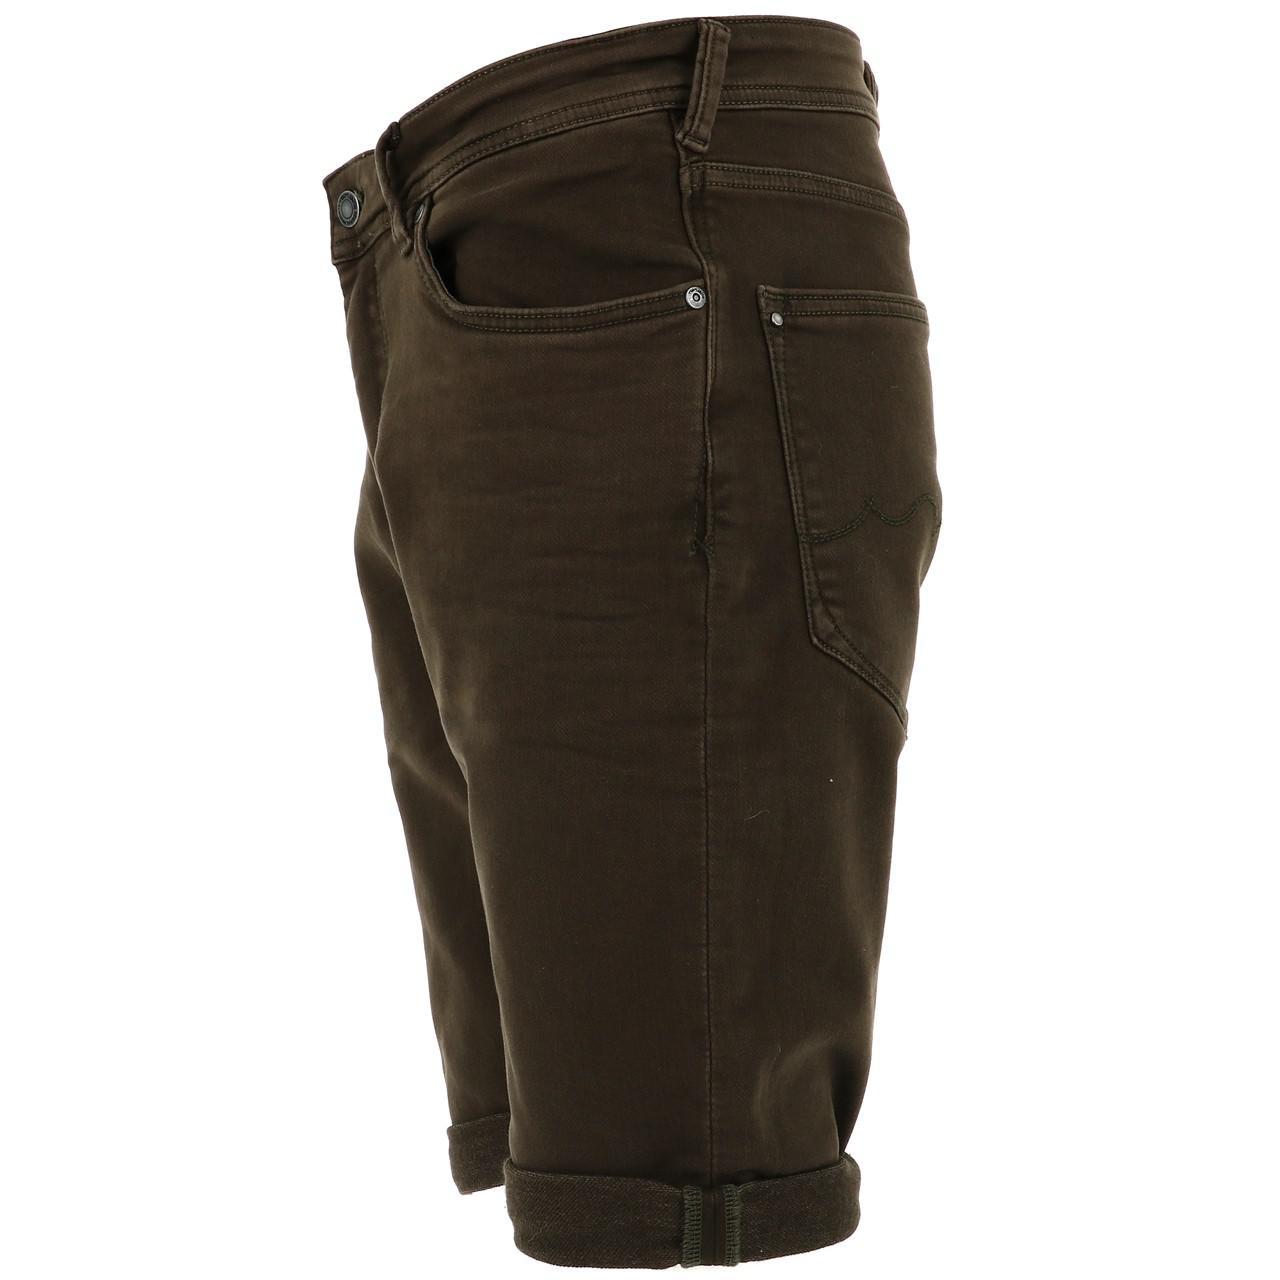 Bermuda-Shorts-Teddy-Smith-Scotty-3-Middl-Khaki-Shorts-Green-18133-New thumbnail 2